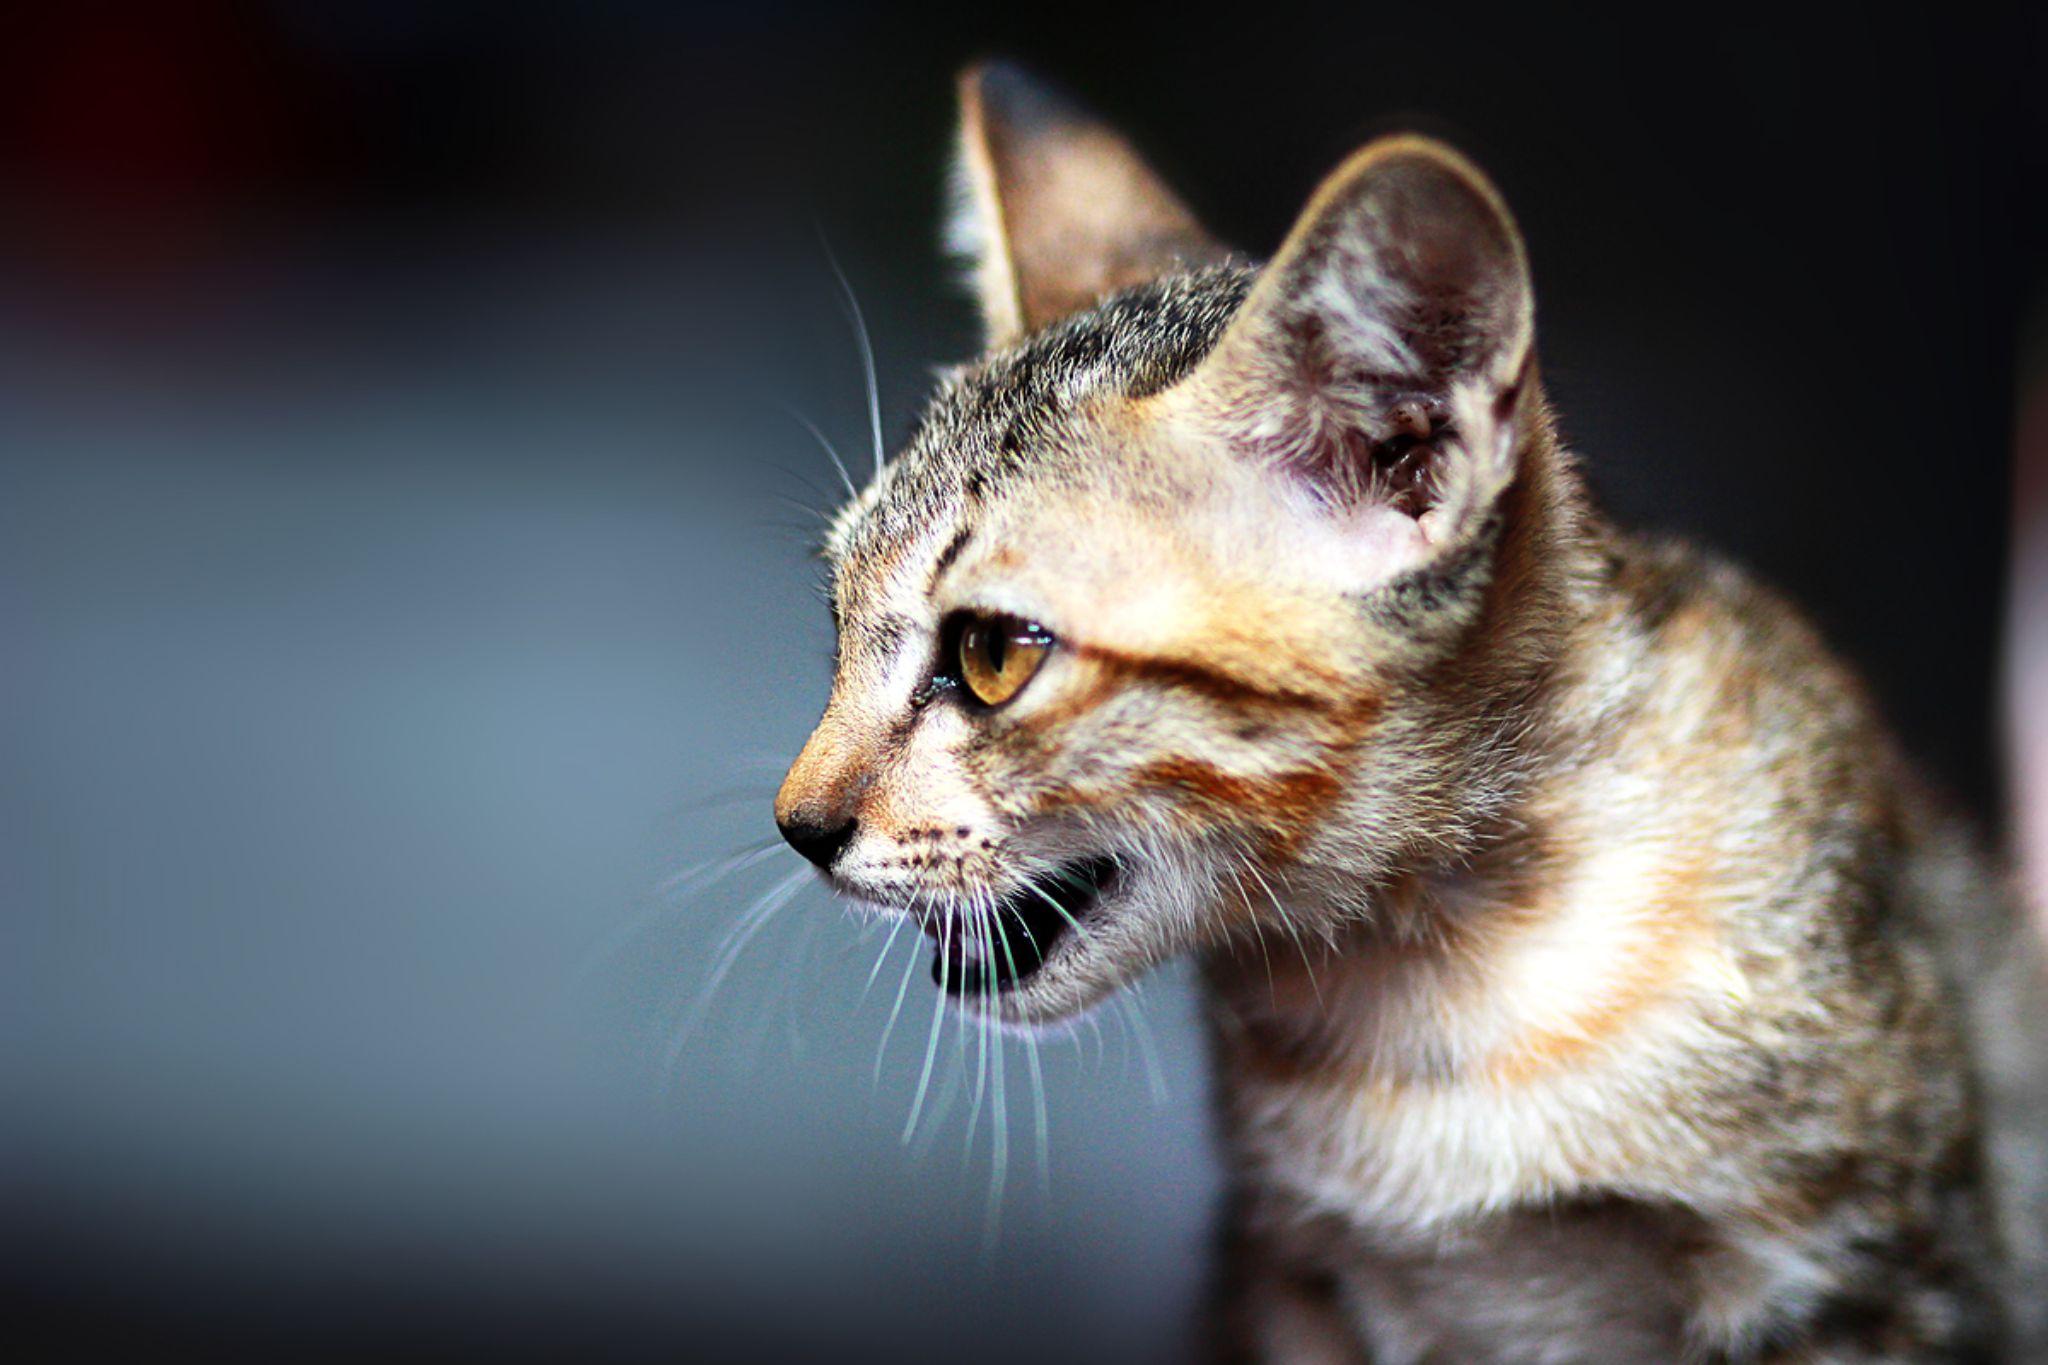 cat by ggpixs